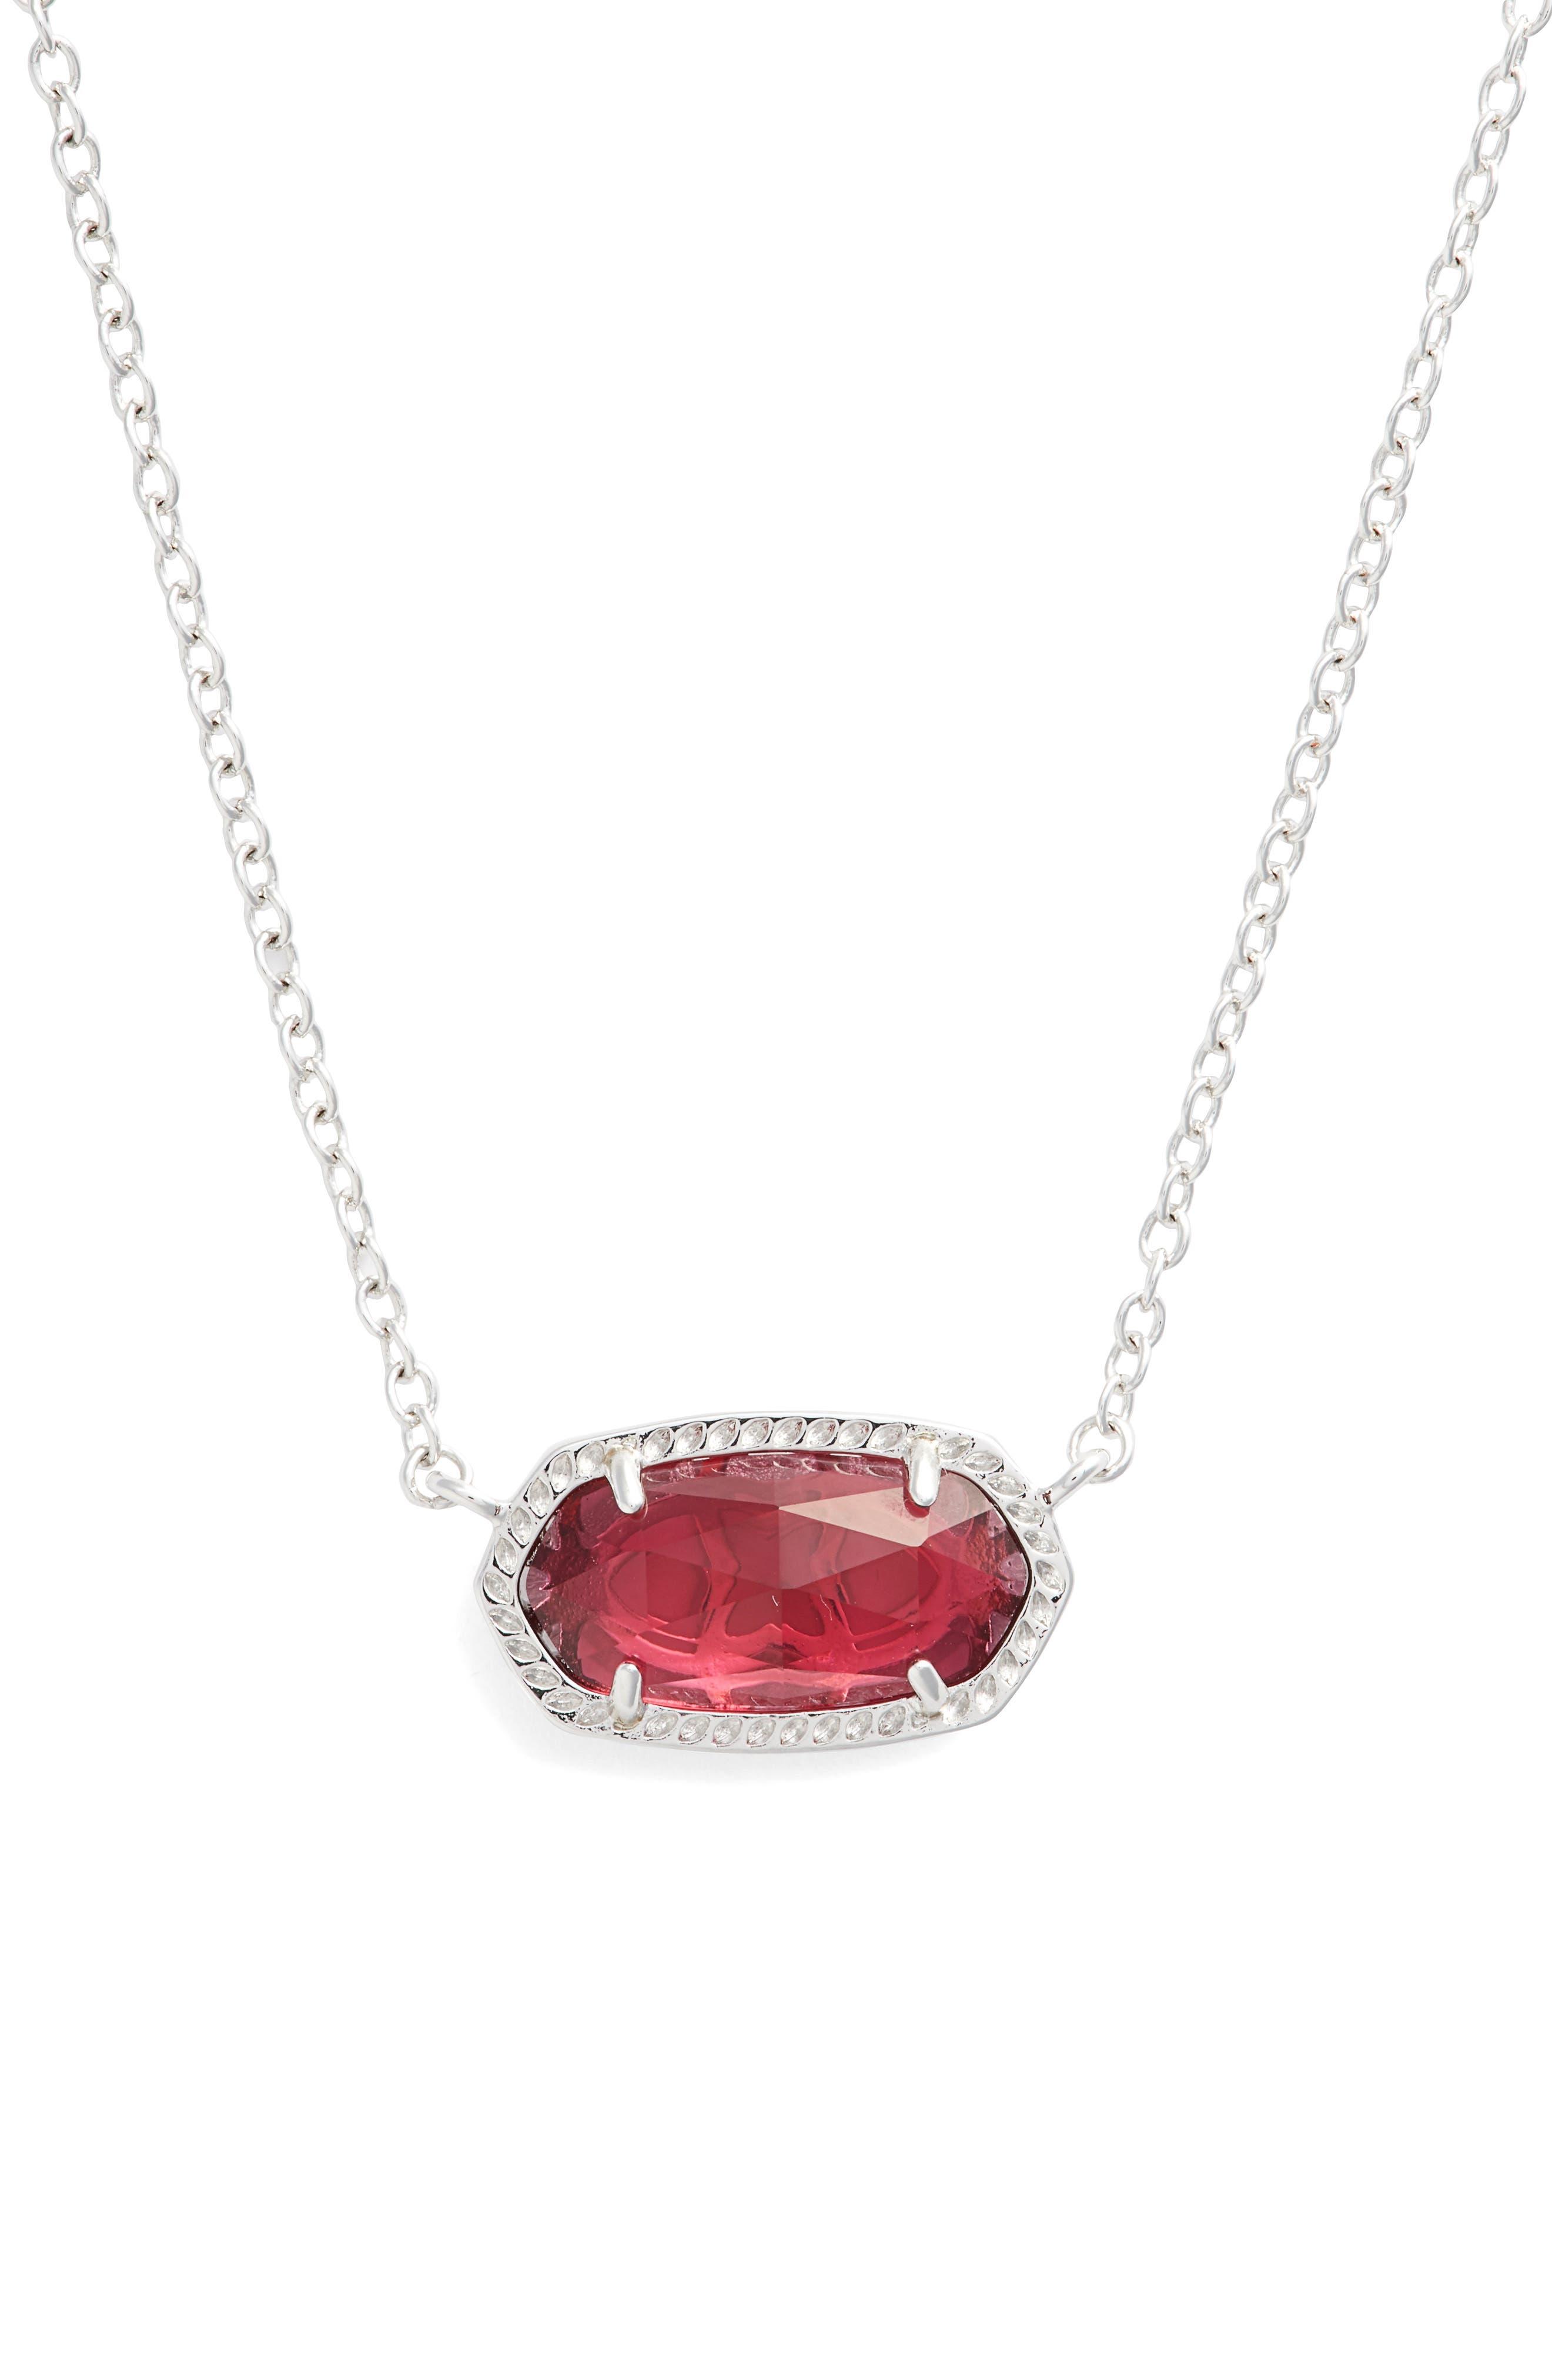 KENDRA SCOTT Elisa Birthstone Pendant Necklace, Main, color, JANUARY/BERRY/SILVER